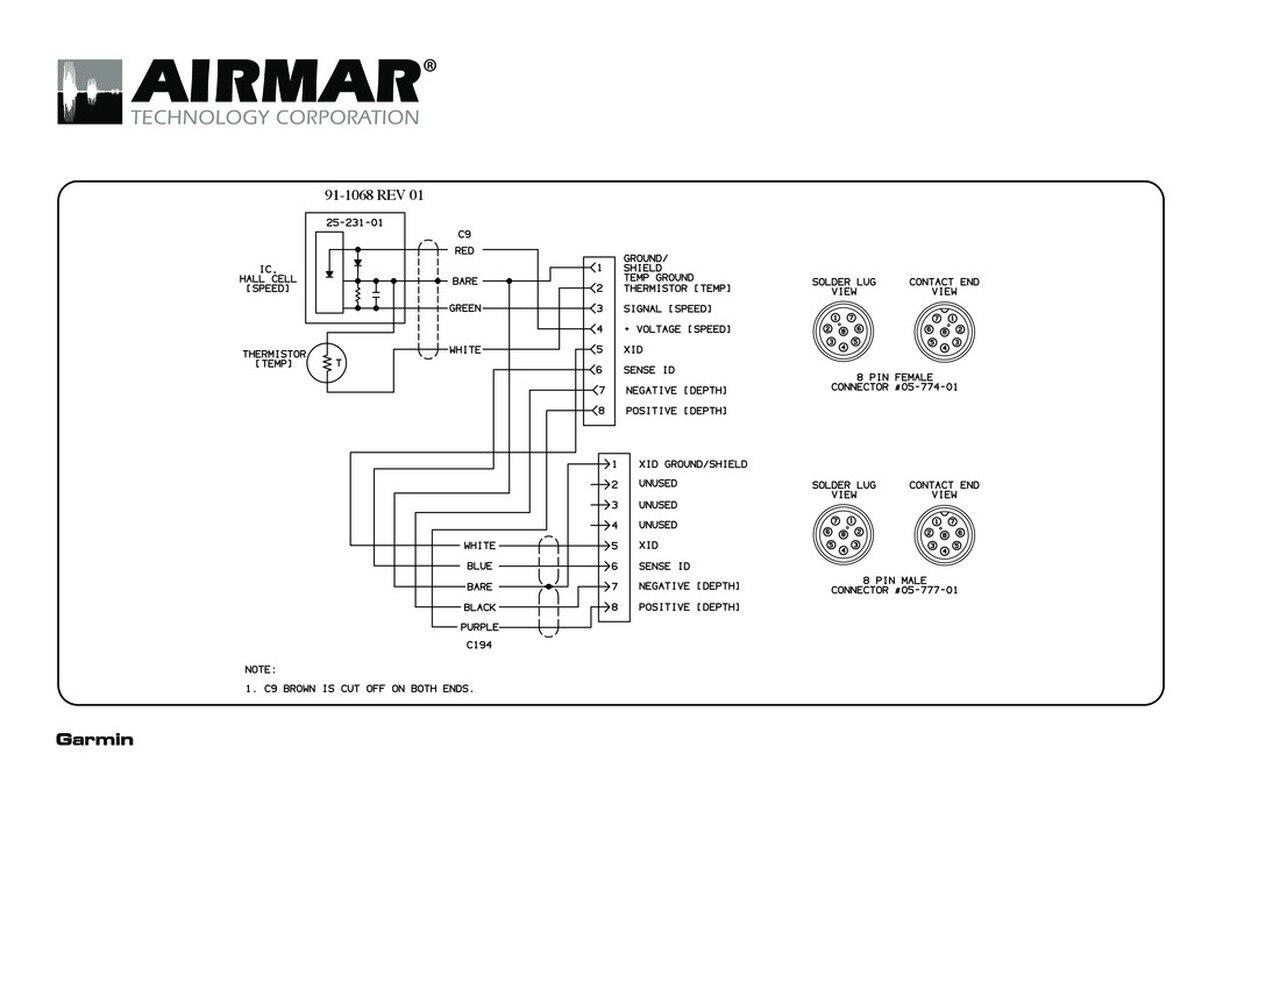 Marvelous Gps 4 Pin Wiring Diagram Wiring Diagram Wiring Cloud Eachirenstrafr09Org